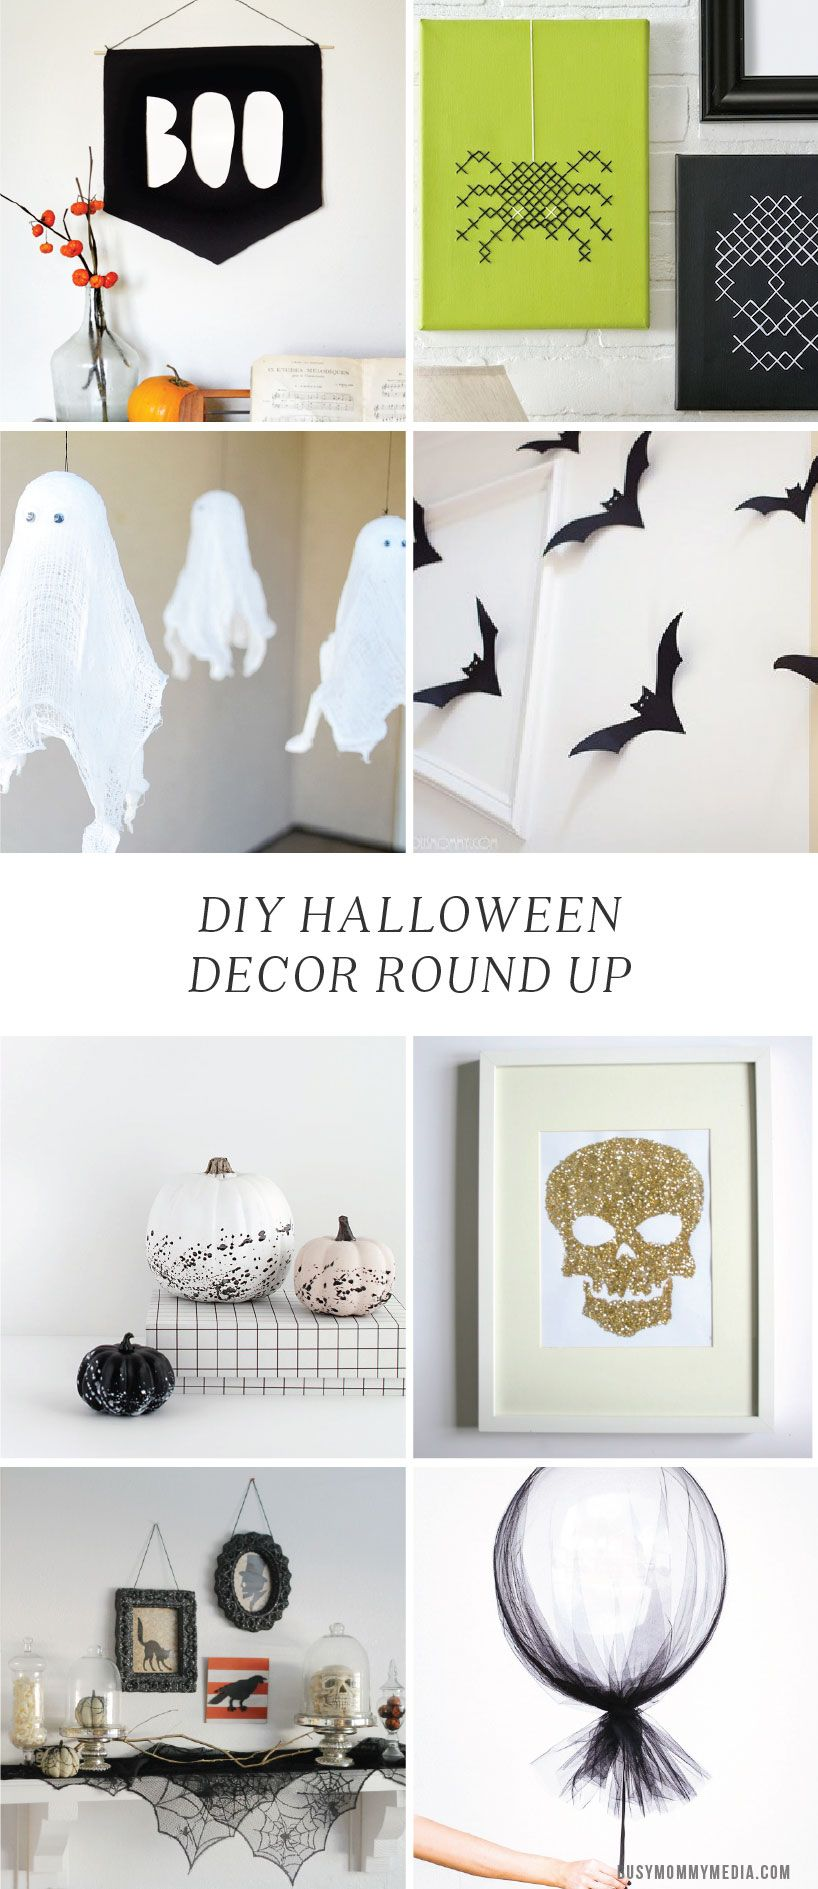 DIY Halloween Decor Round up | Grandmothers, Home-made Halloween and ...